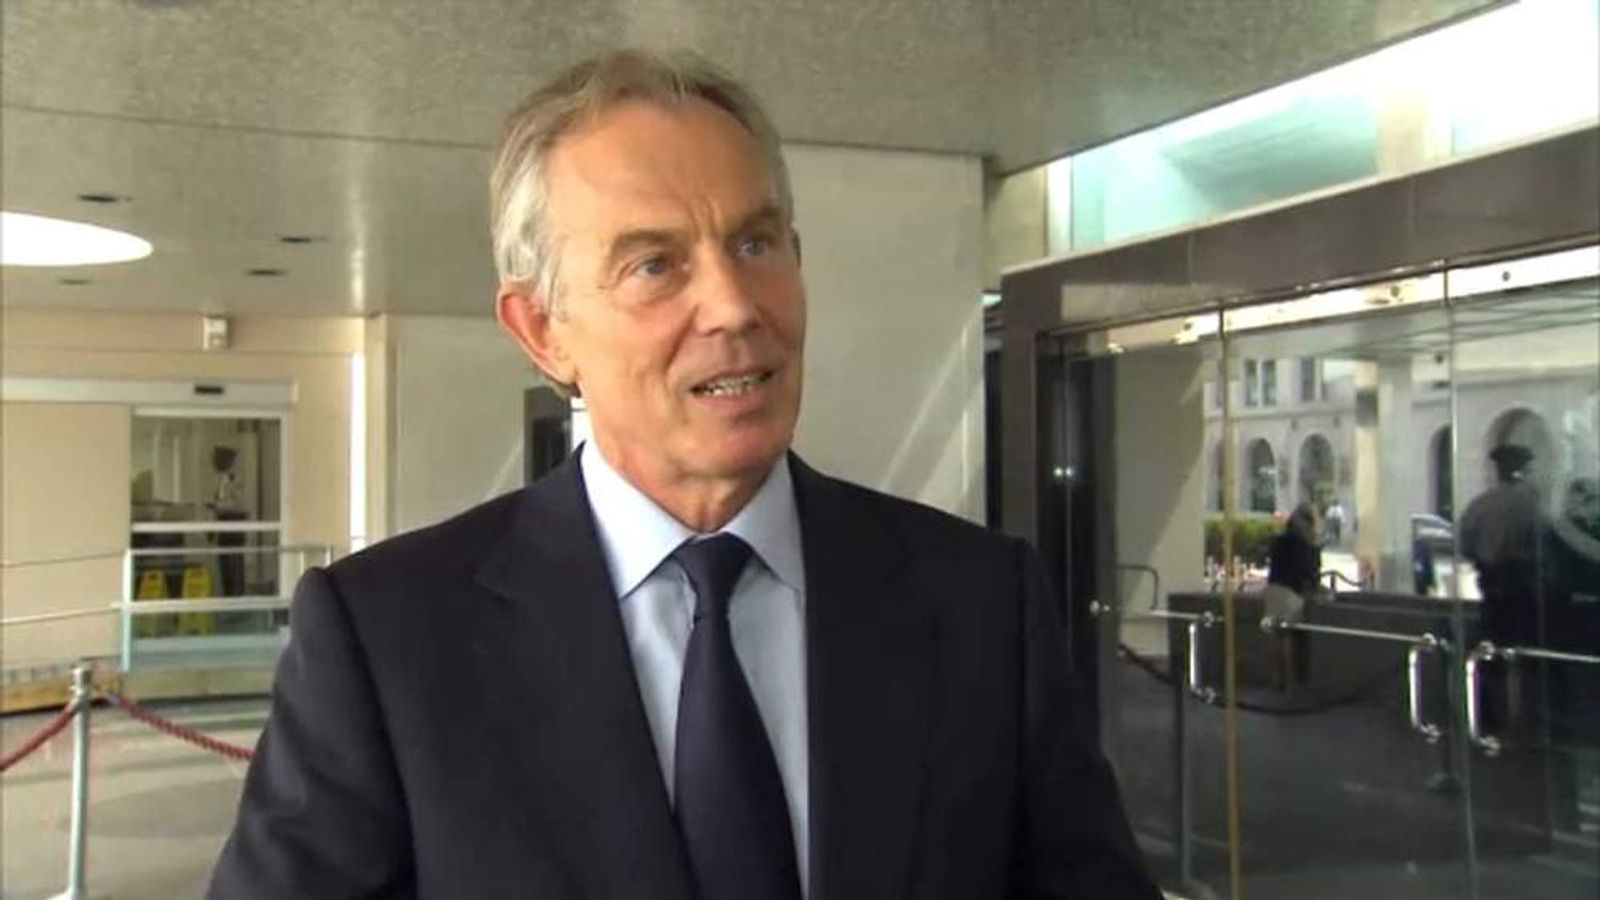 Tony Blair on Baroness Thatcher's death